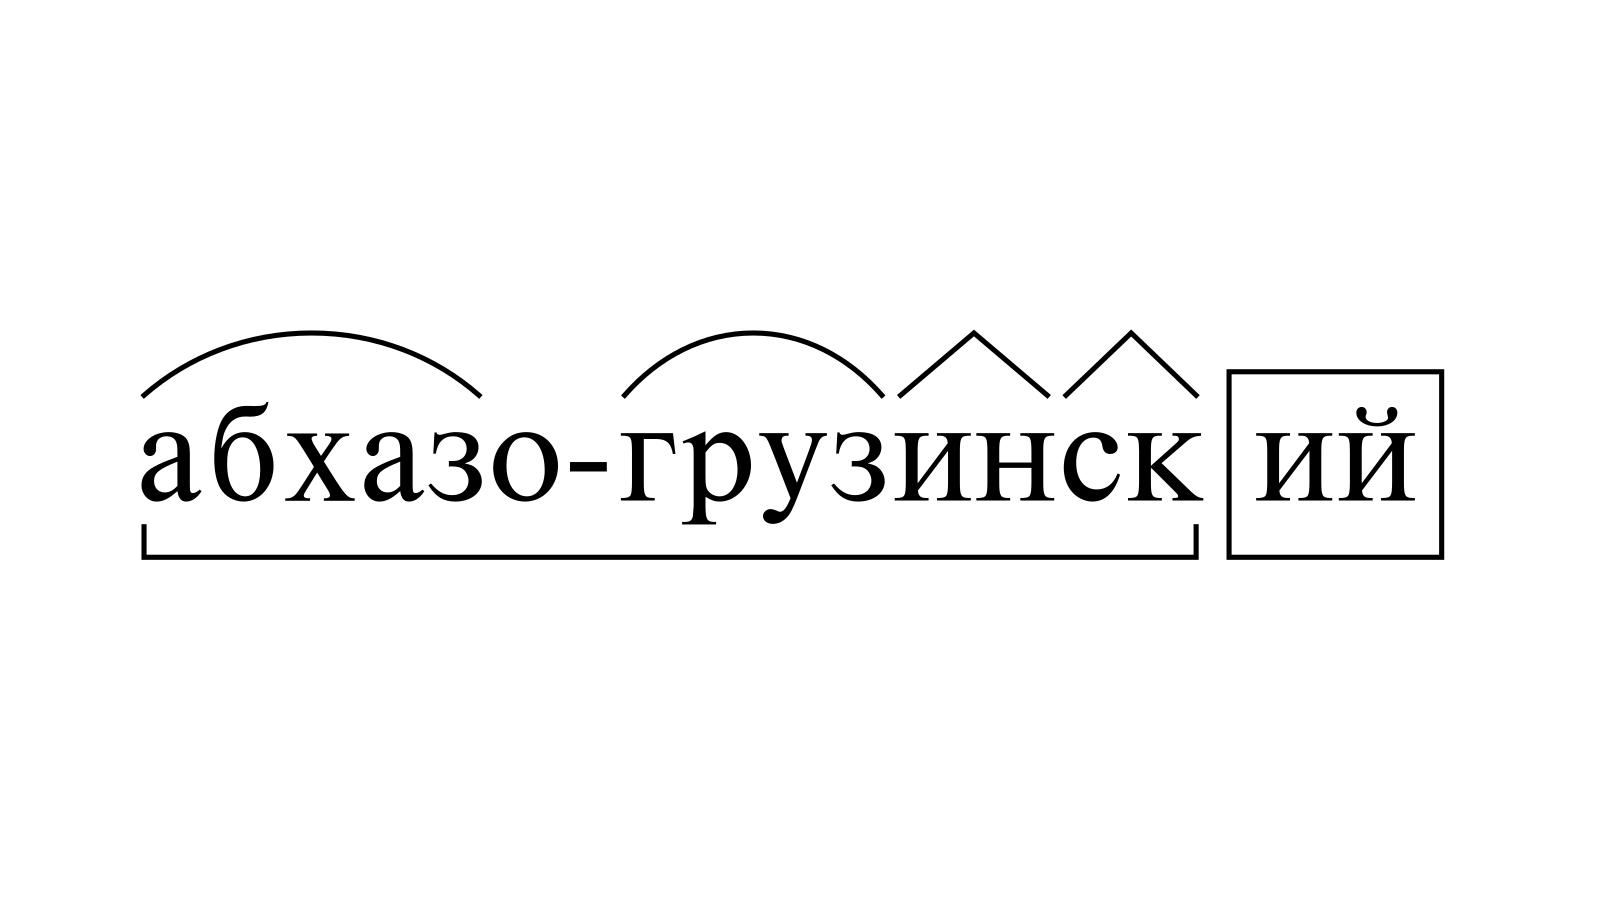 Разбор слова «абхазо-грузинский» по составу